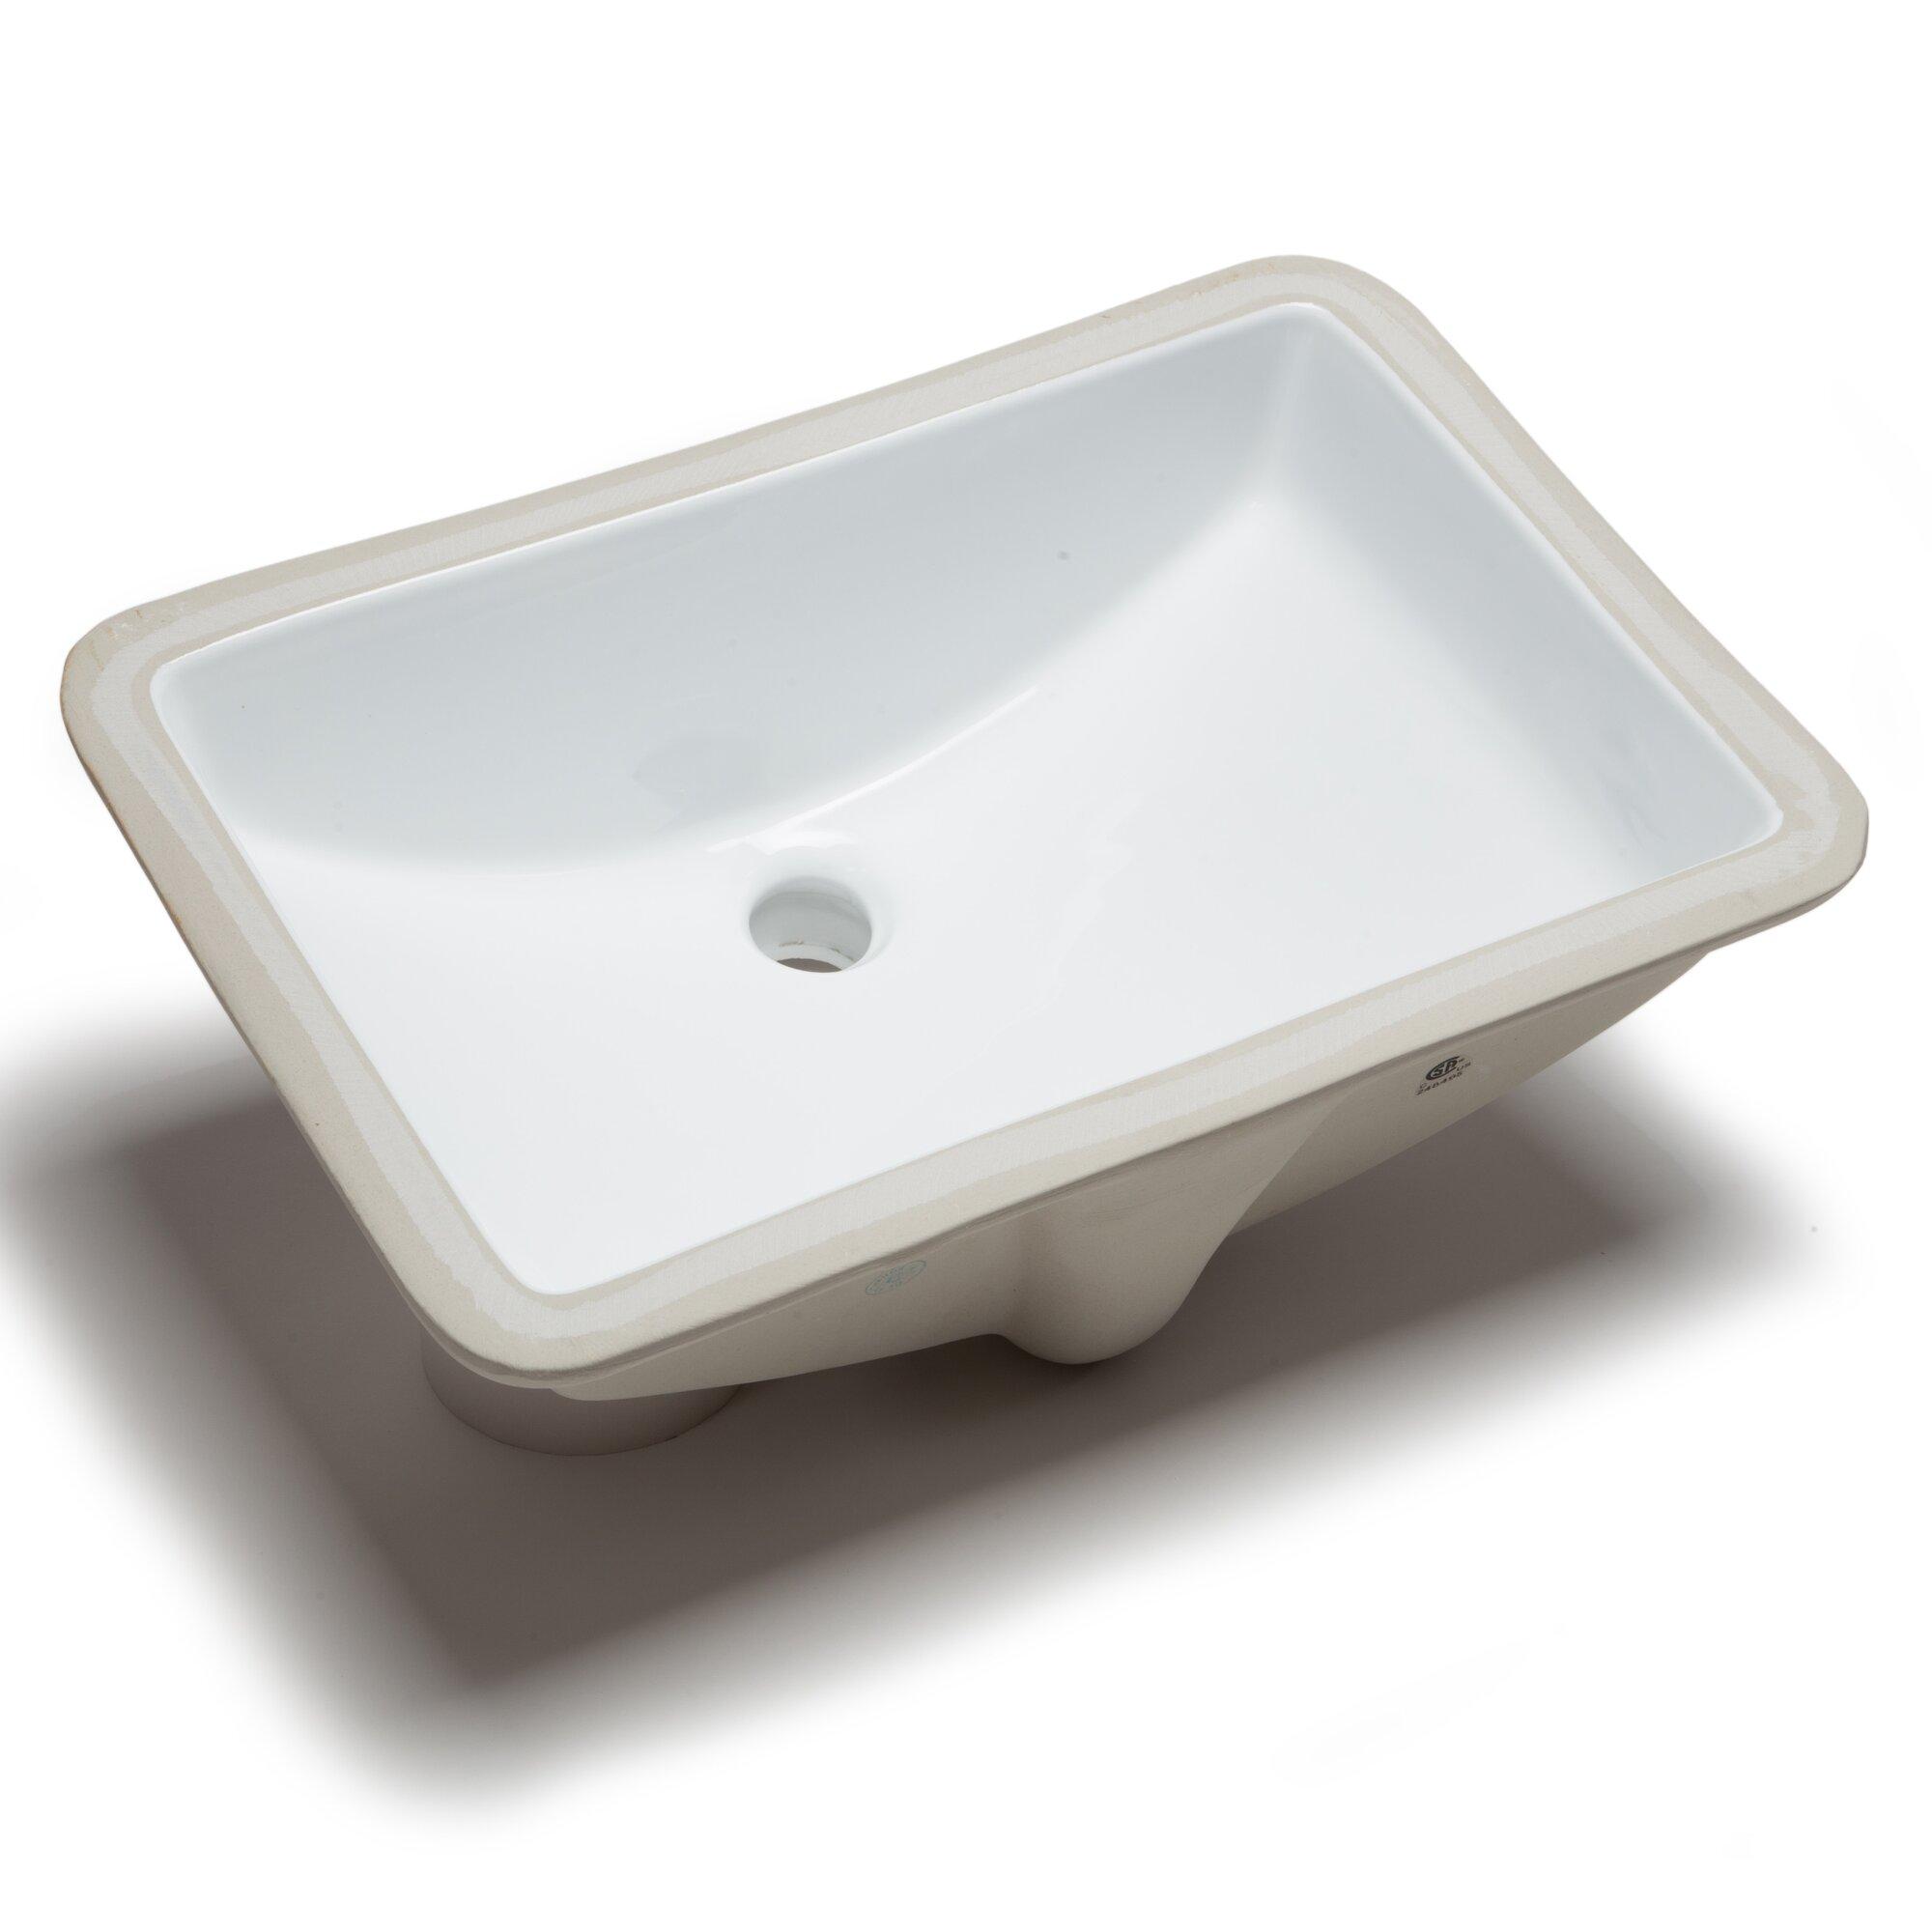 Hahn ceramic bowl rectangular undermount bathroom sink with overflow reviews wayfair for Rectangle undermount bathroom sink